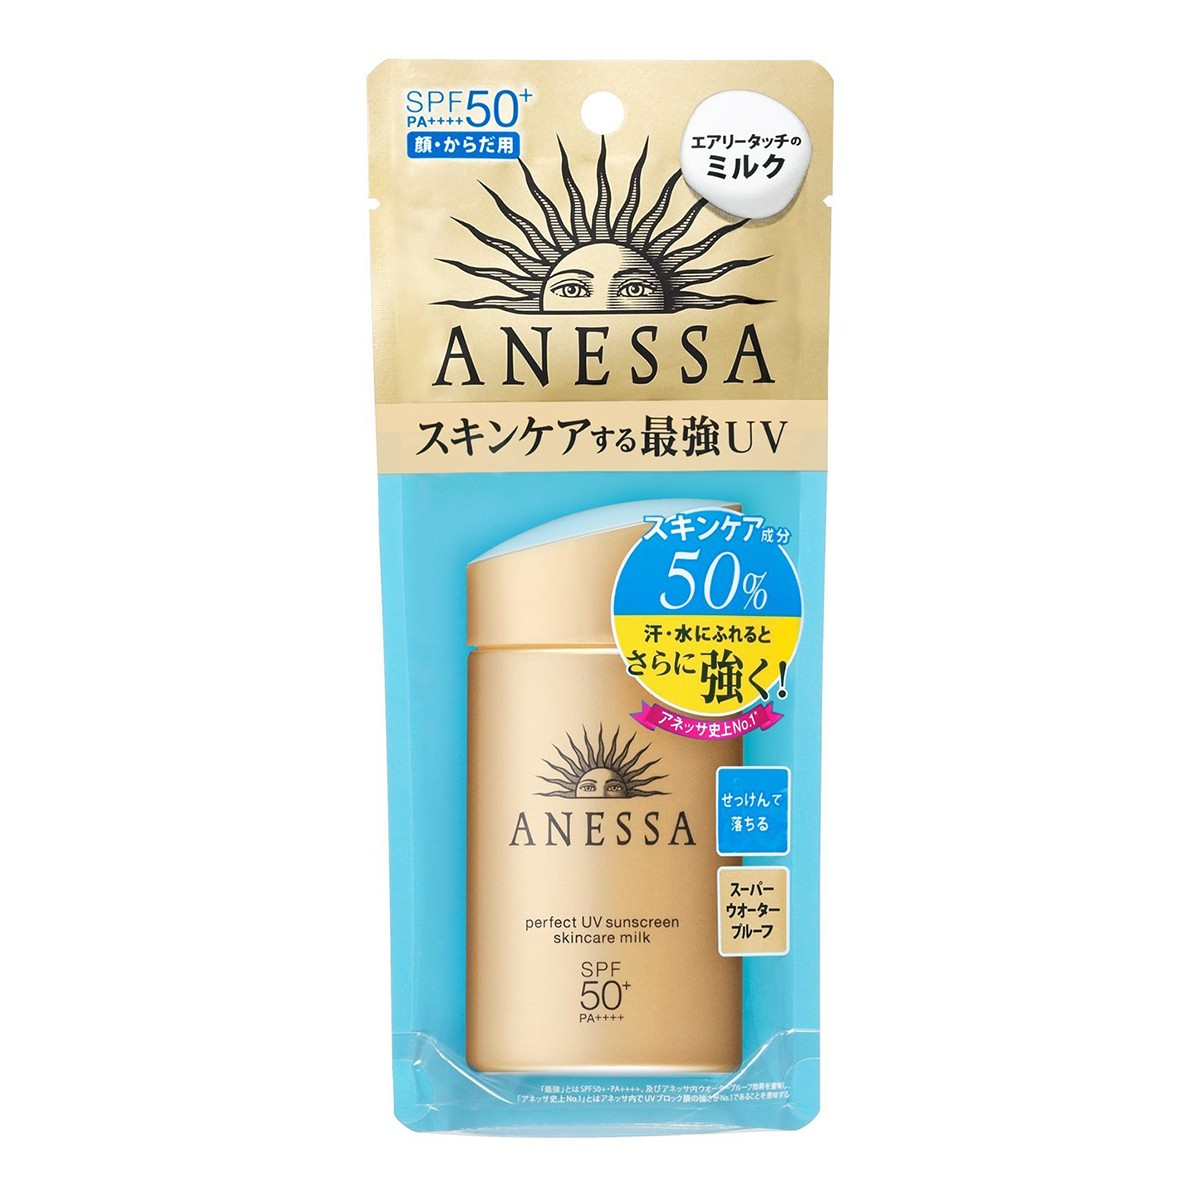 SHISEIDO ANESSA Perfect UV Sunscreen Skincare Milk Gold Normal Skin SPF50+ PA++++ 60ml